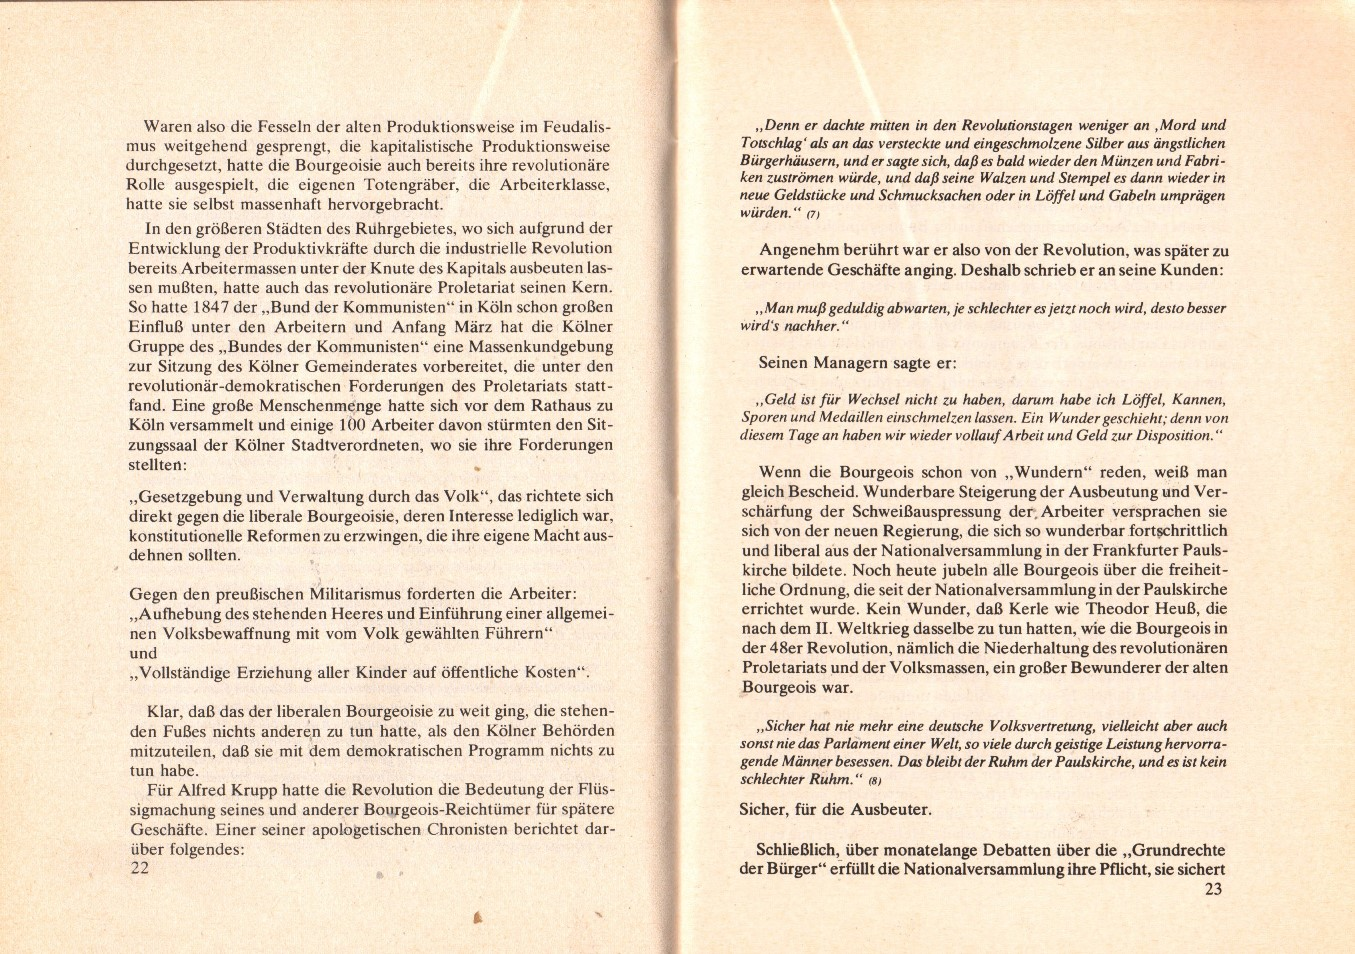 NRW_KBW_1977_Politik_der_Kohle_u_Stahlbarone_12